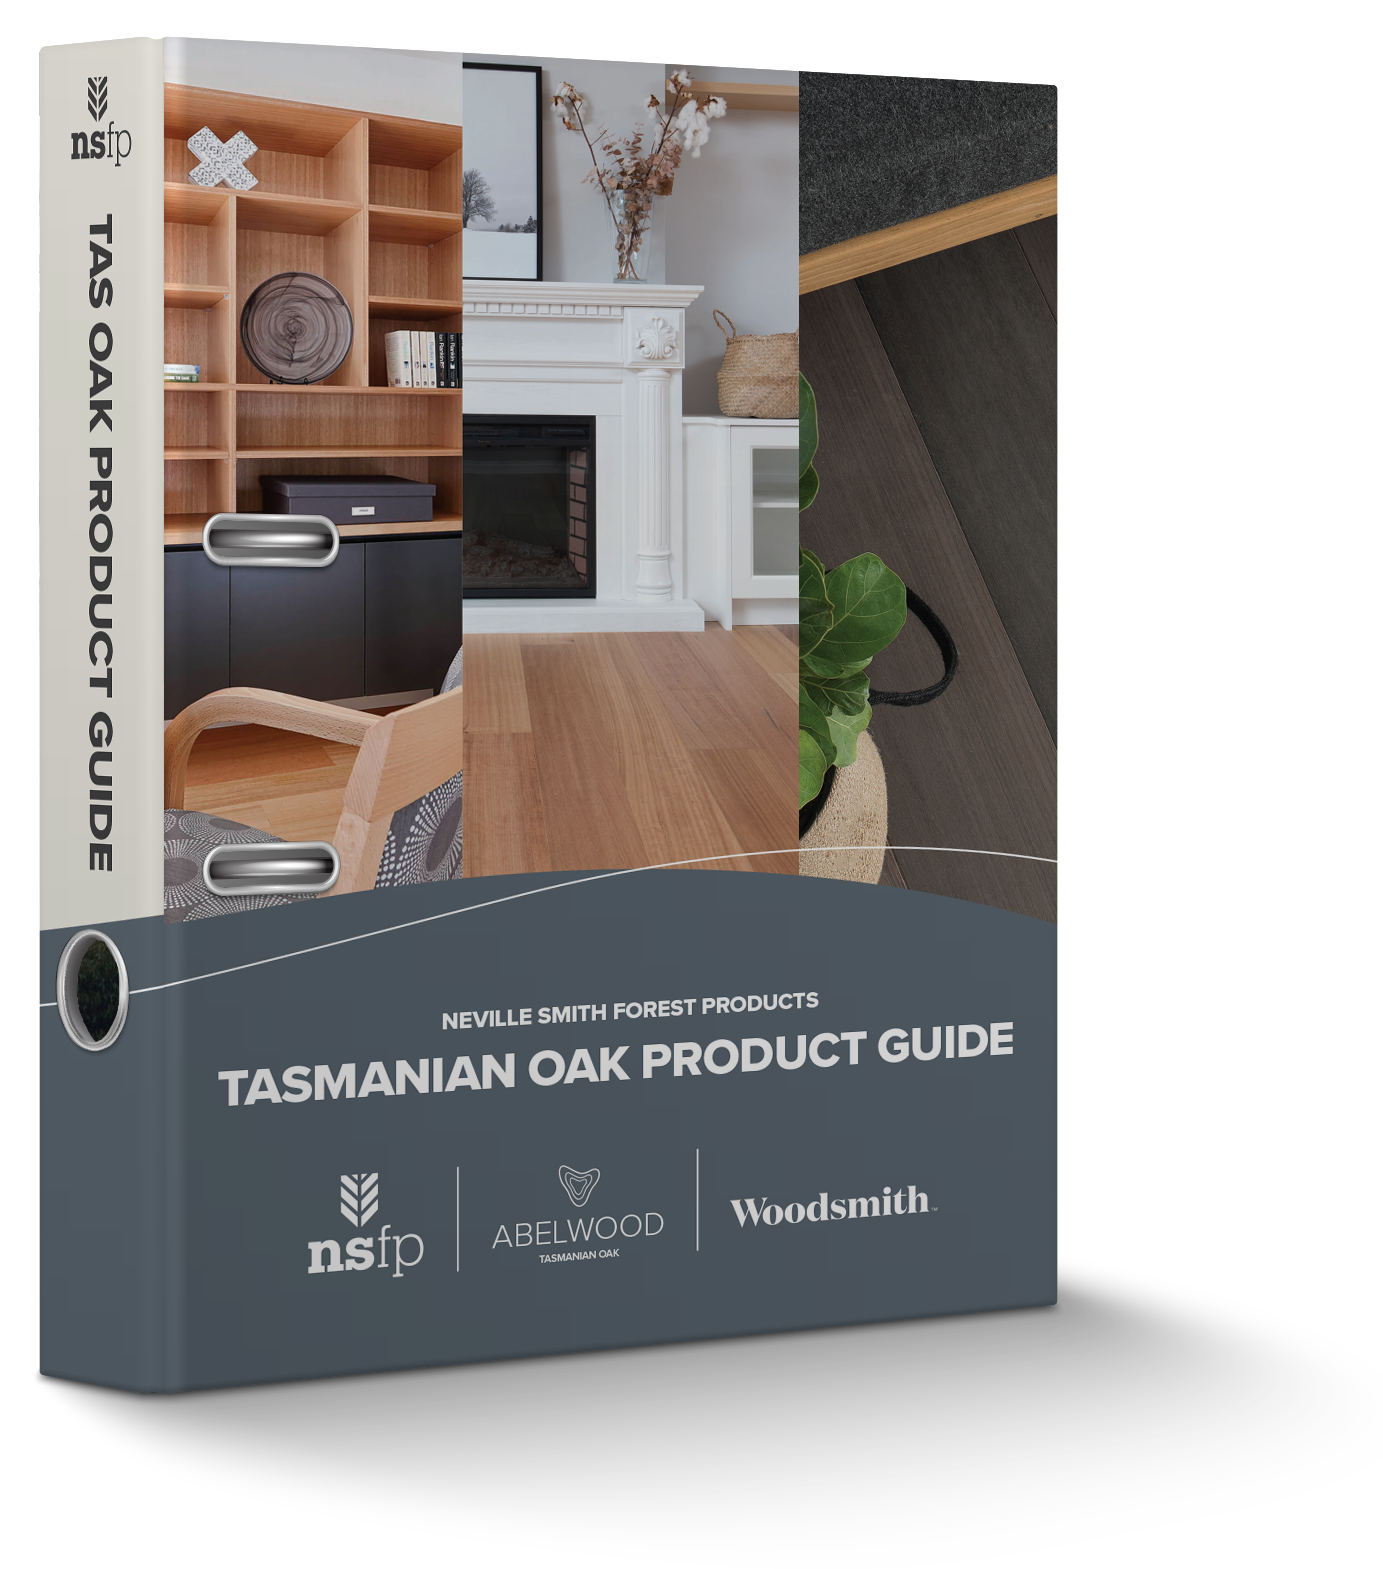 NSFP Tas Oak Product Guide